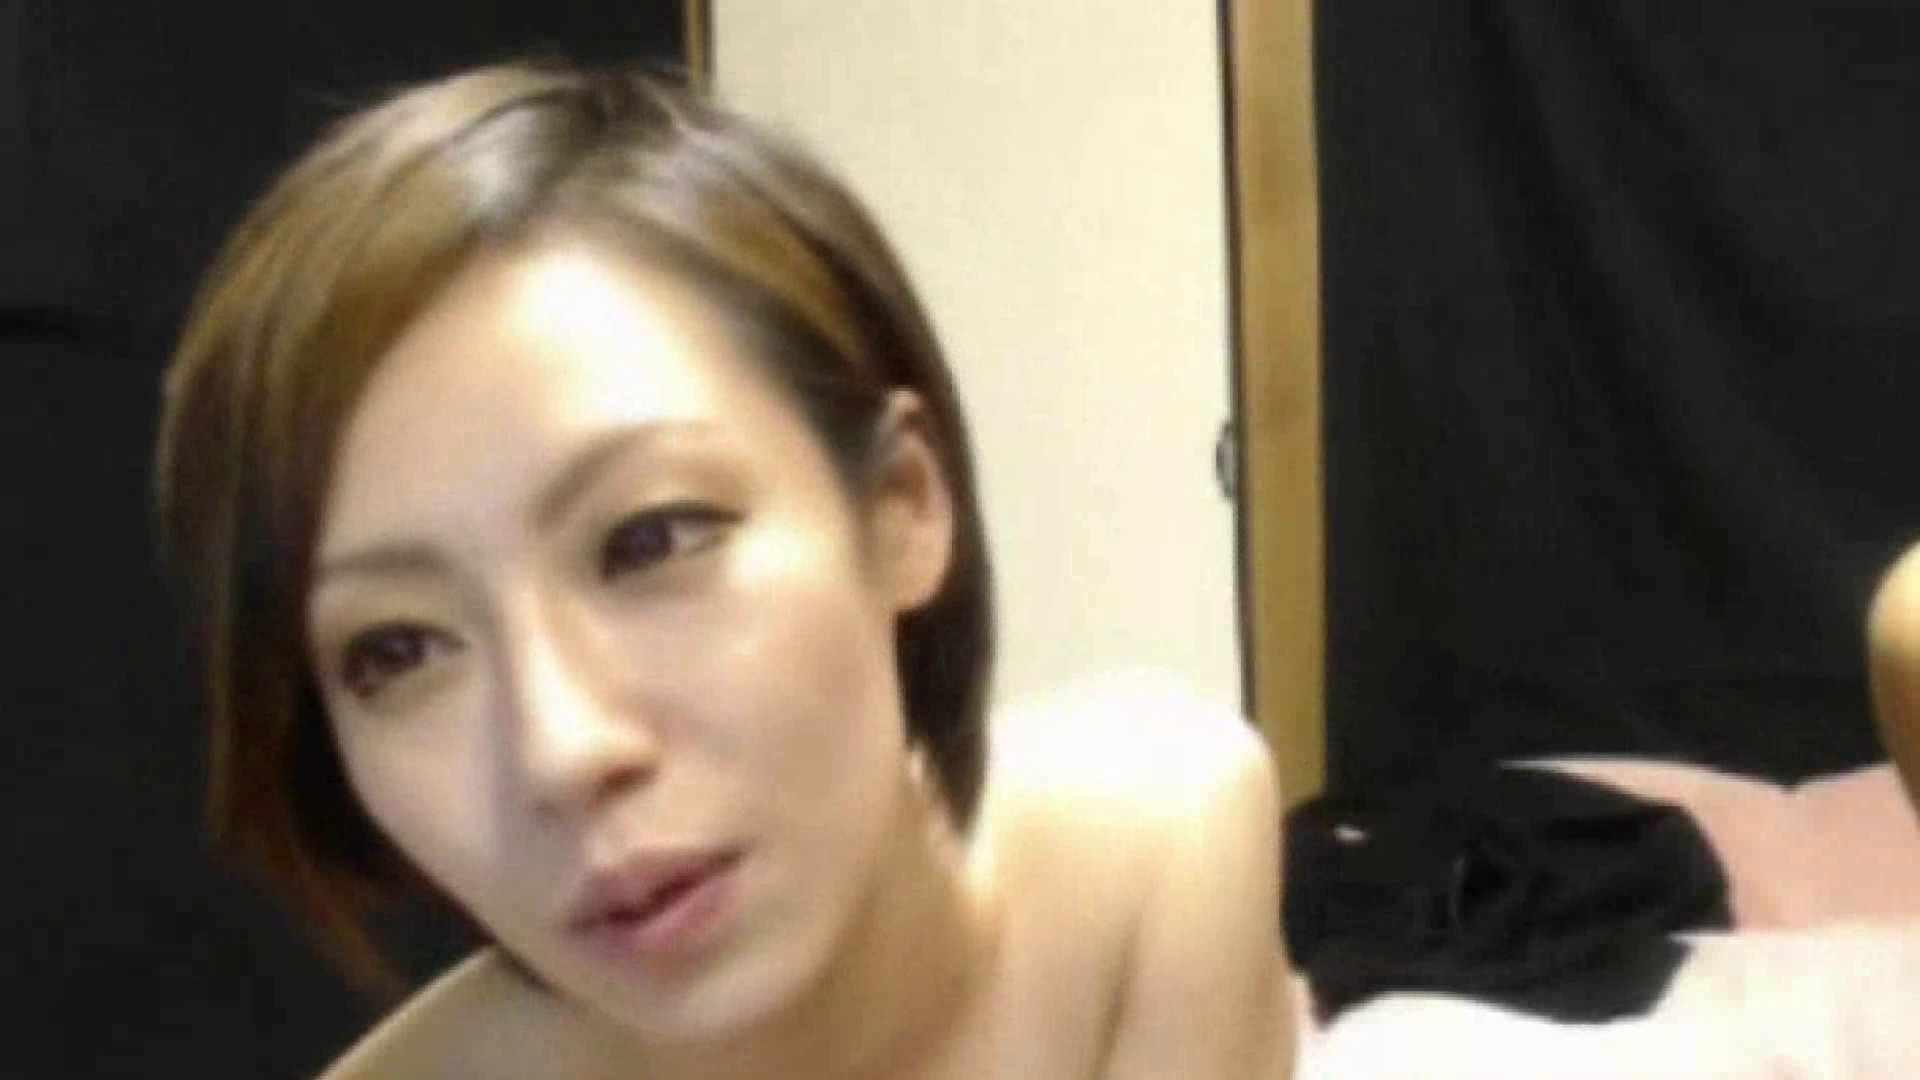 S級ギャルのハメ撮り!生チャット!Vol.23前編 美女 ぱこり動画紹介 98連発 19